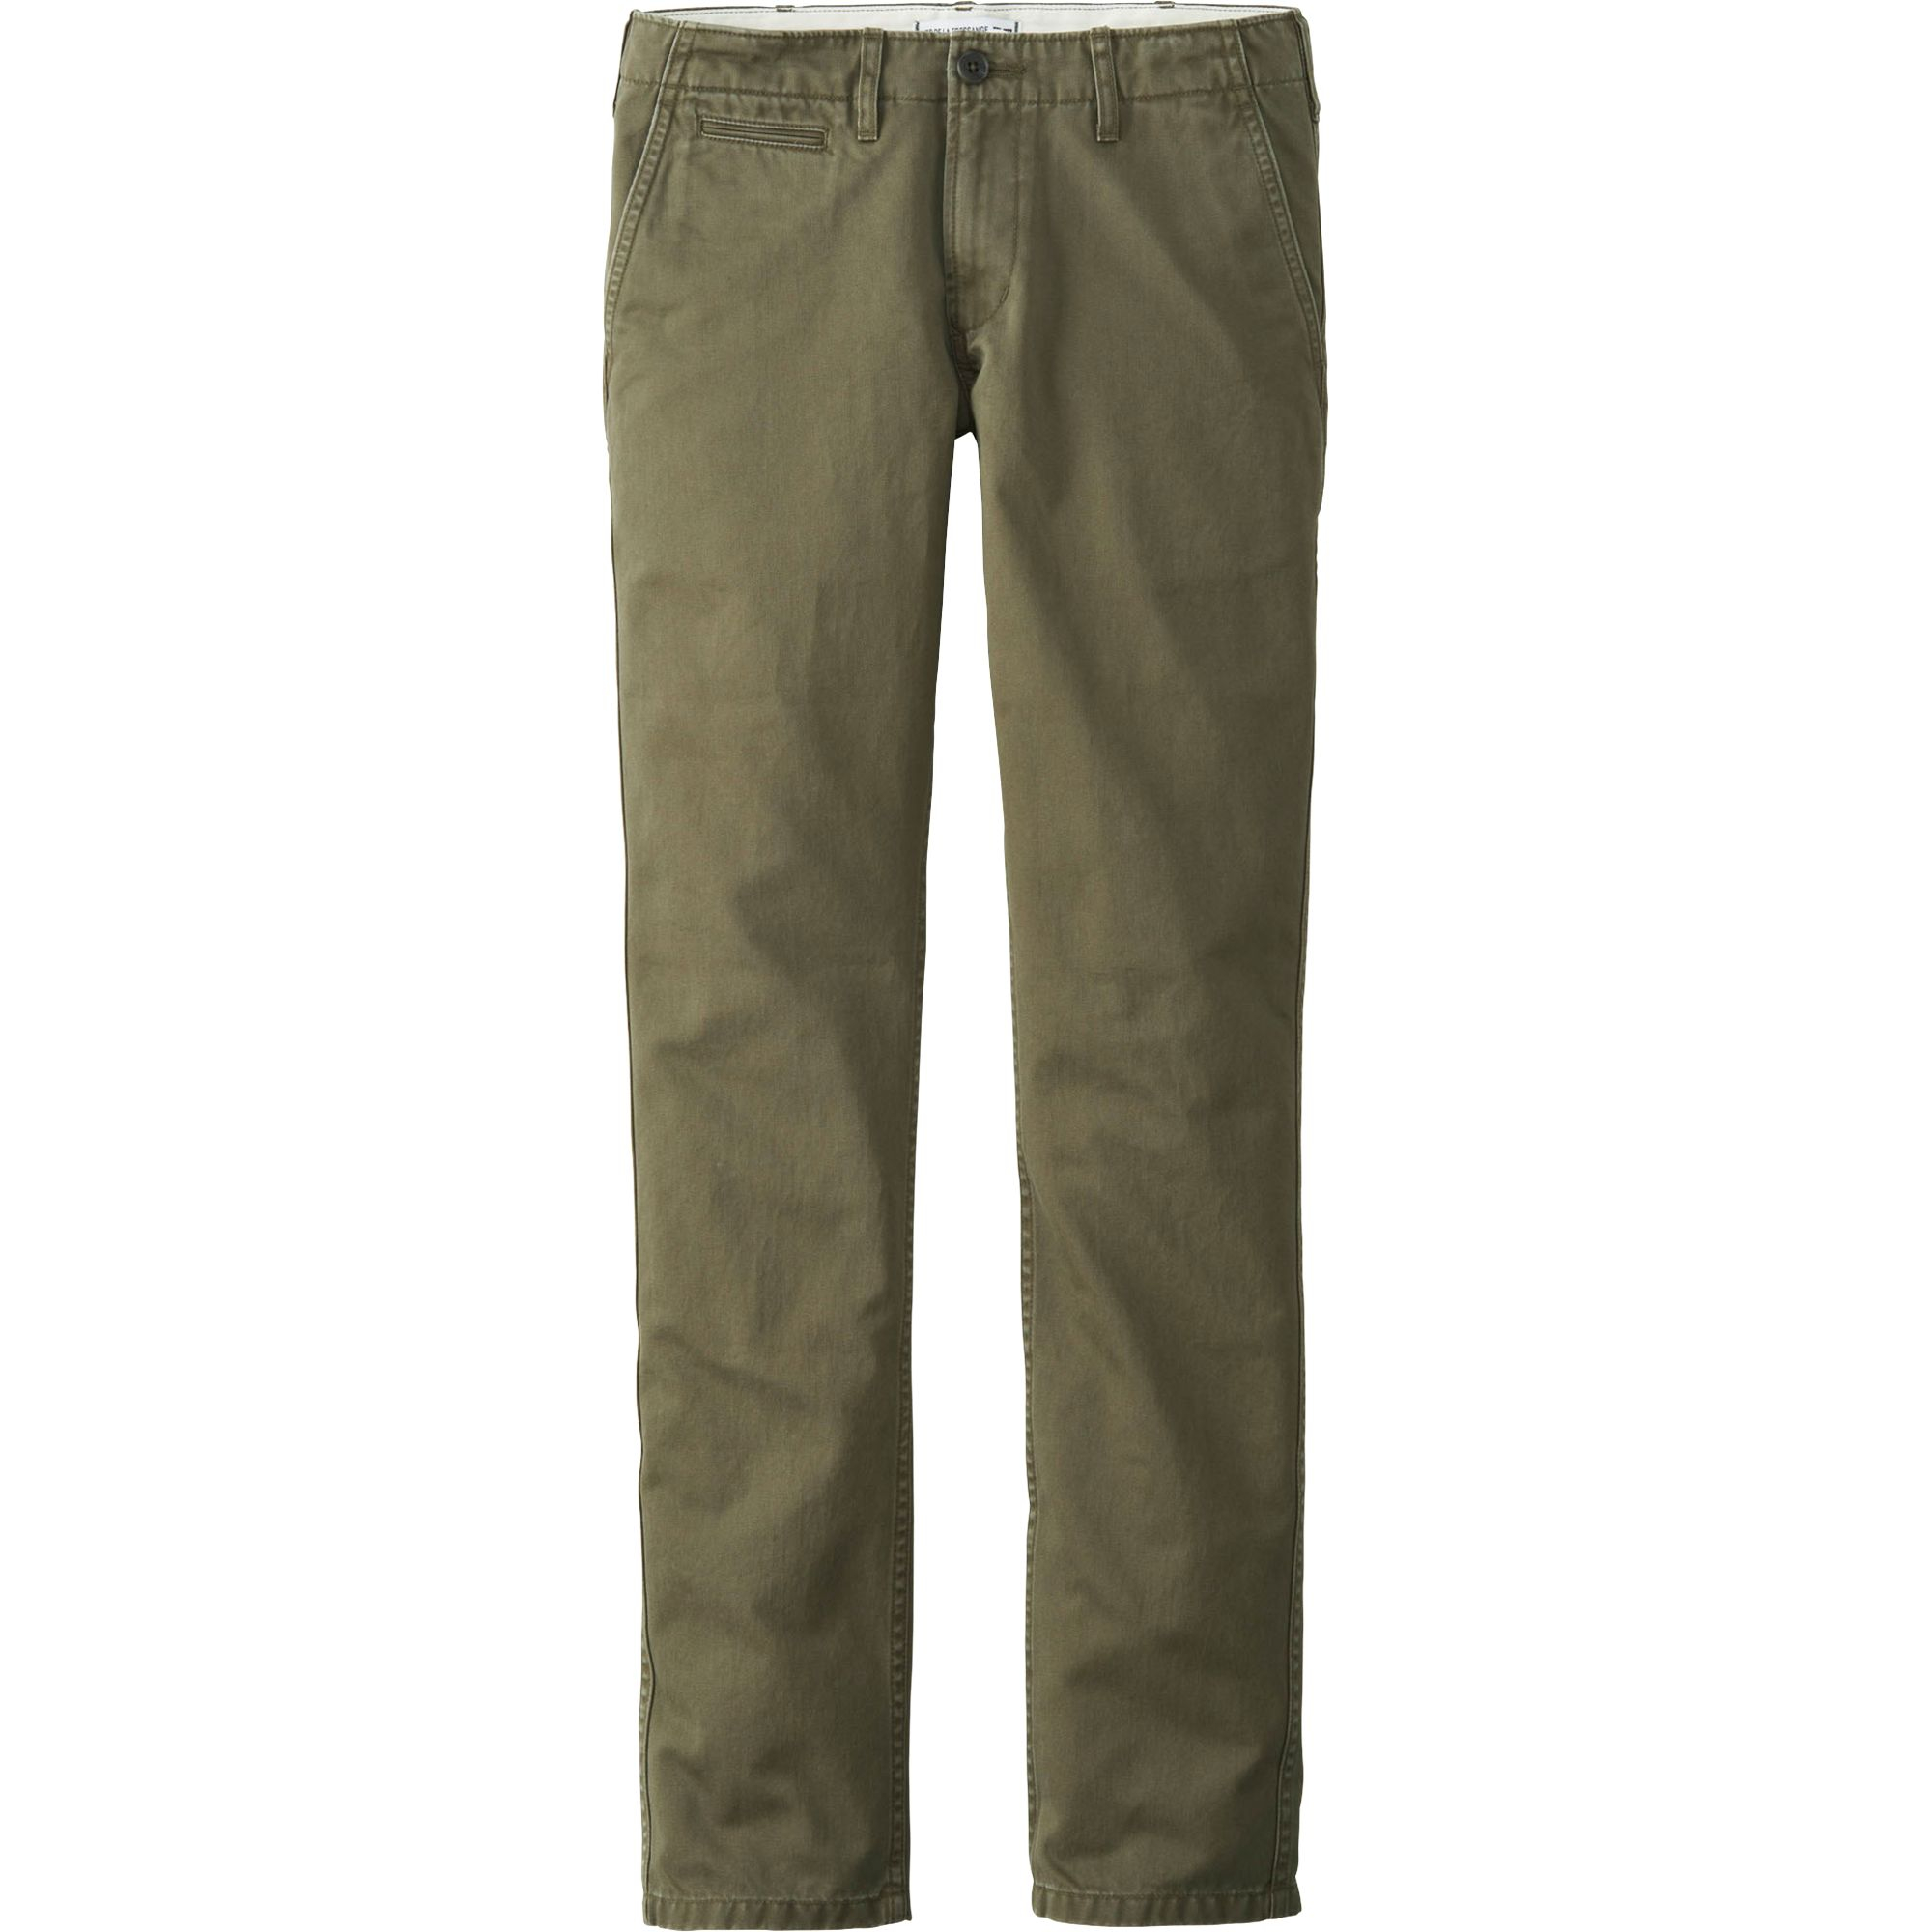 Cool  9796 NEW Womens Brooke Green Twill Skinny Chino Pants 10 BHFO  EBay